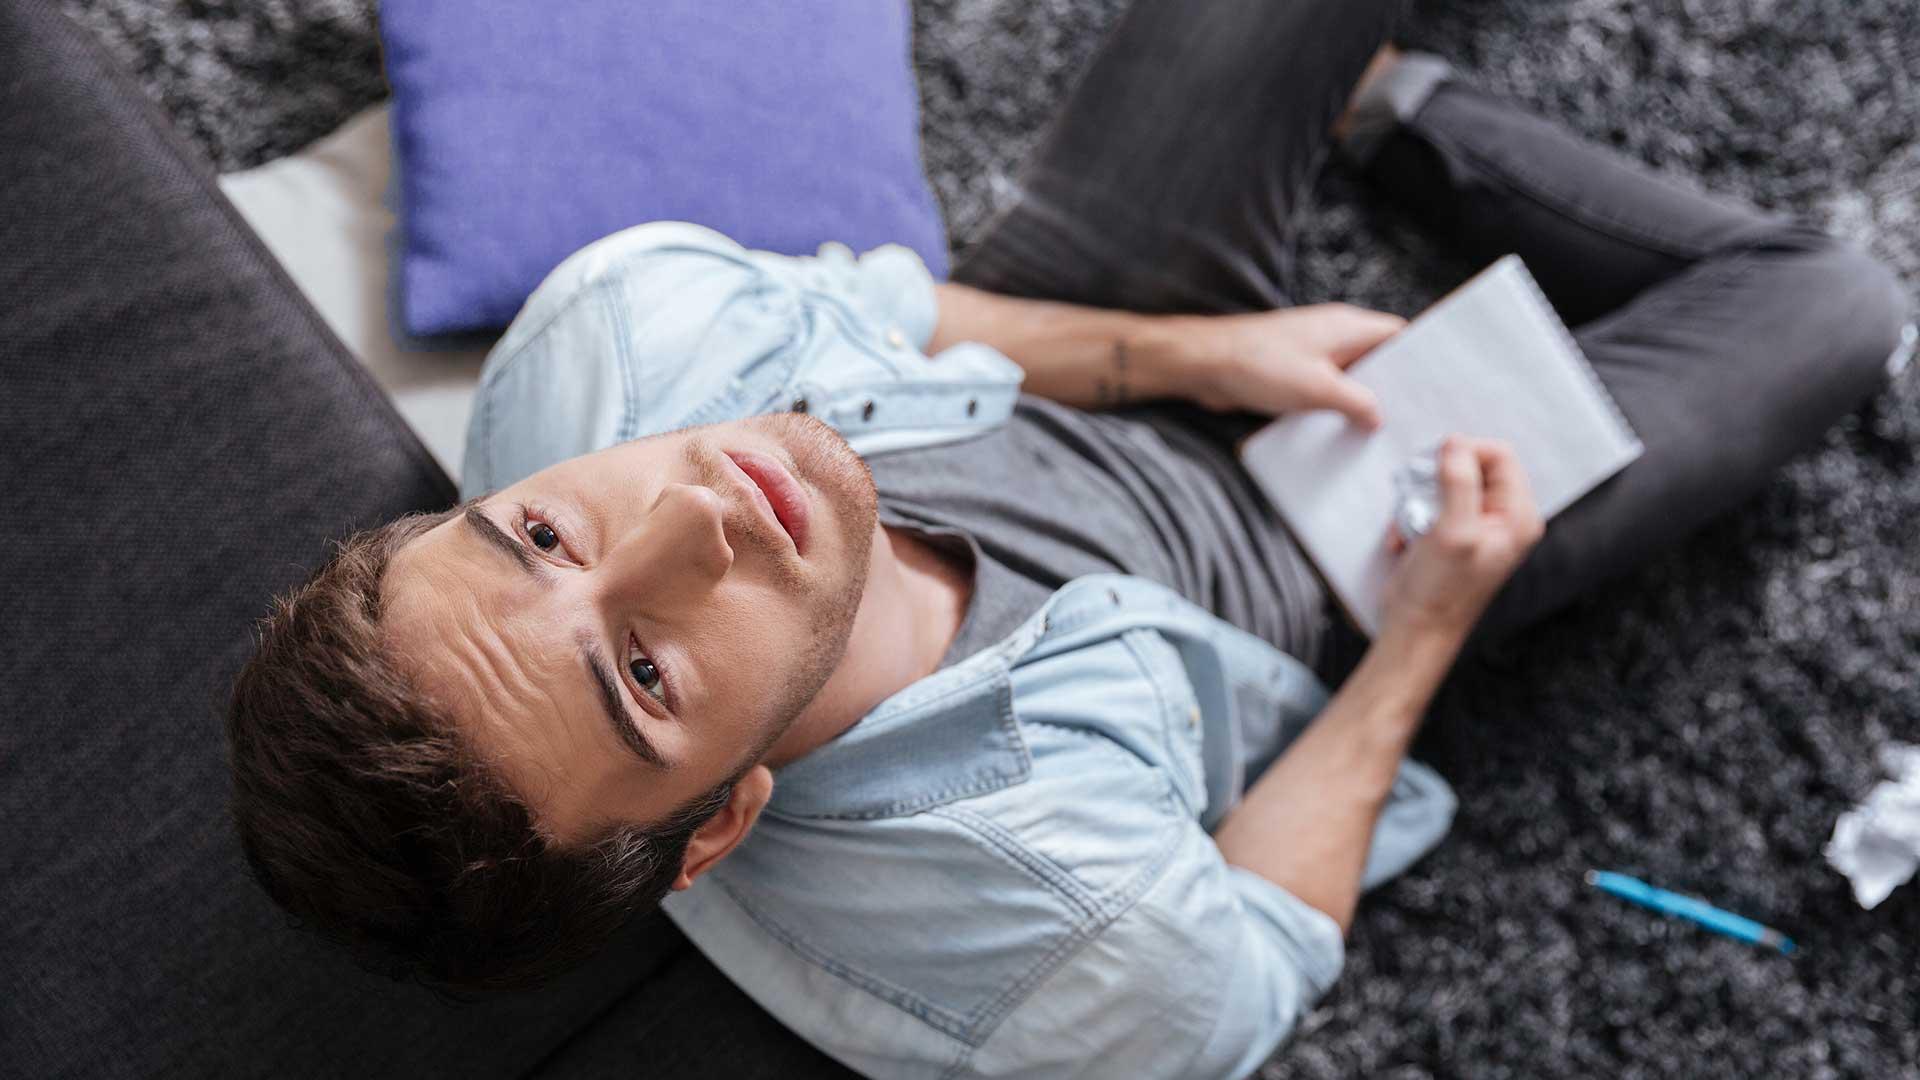 Three Clever Ways to Brainstorm Headlines